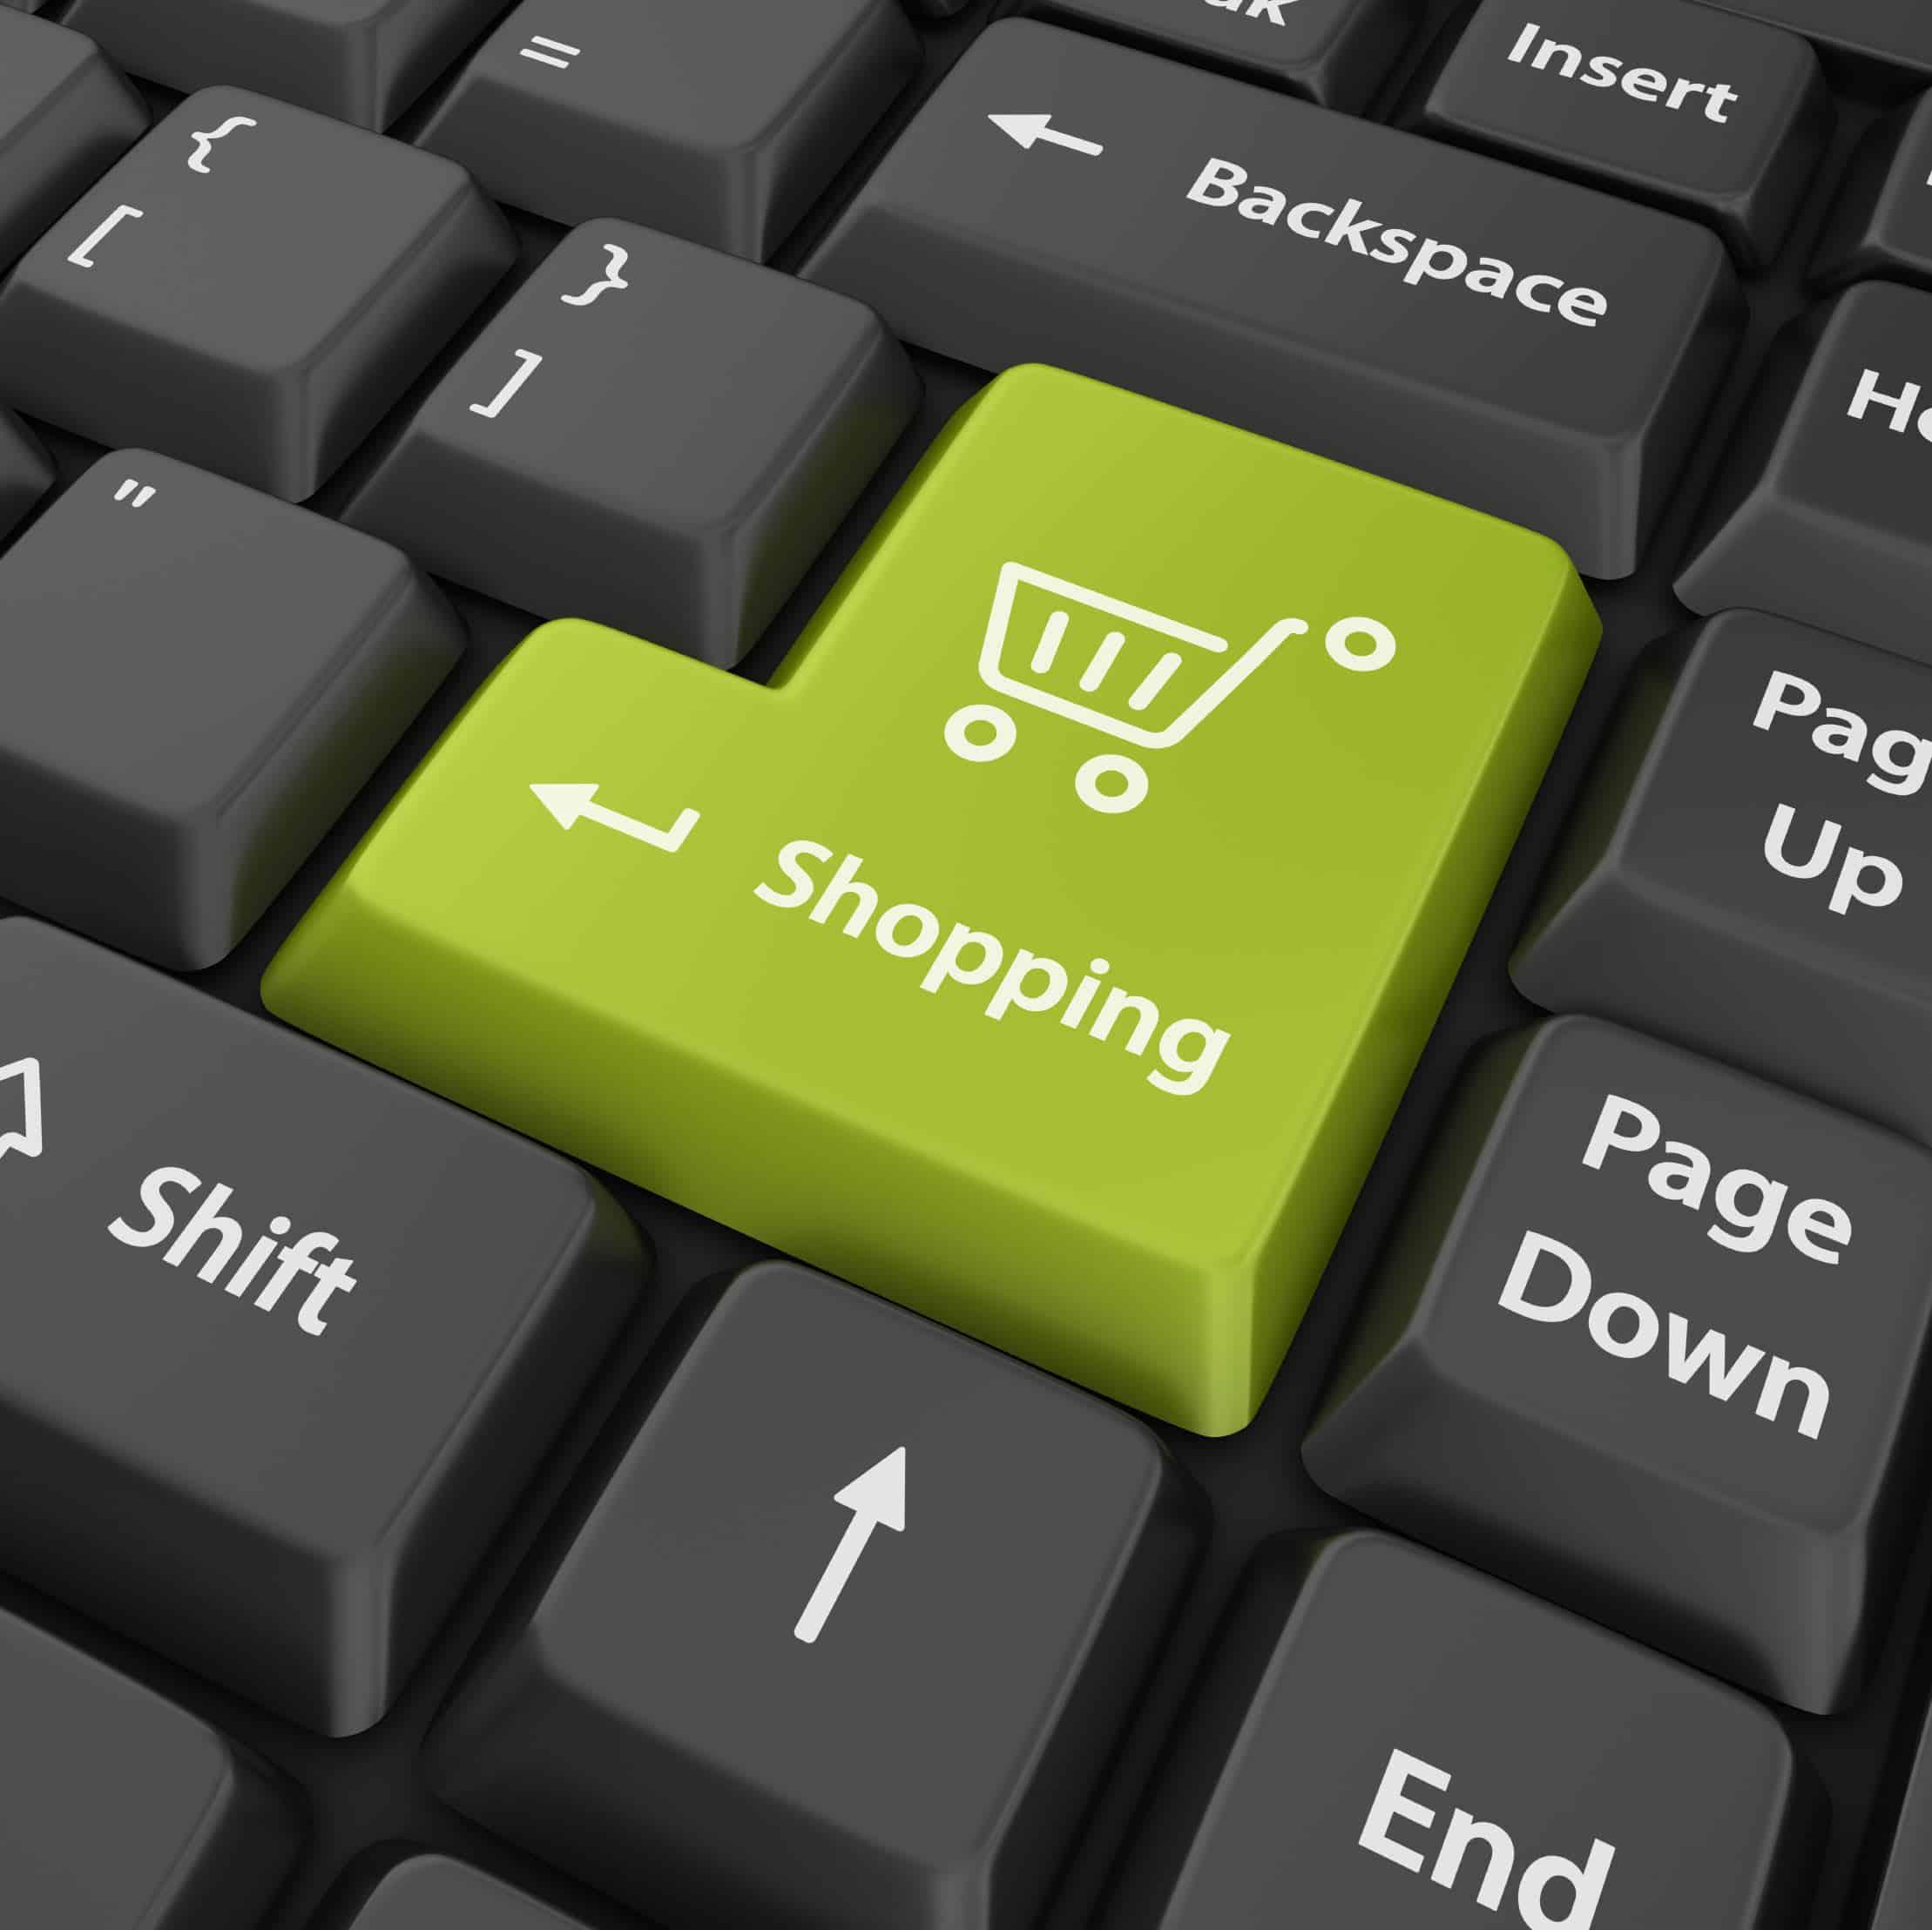 online-shop تحديث Penguin 3.1 : سيطرة المتاجر الإلكترونية الصغيرة على نتائج البحث !